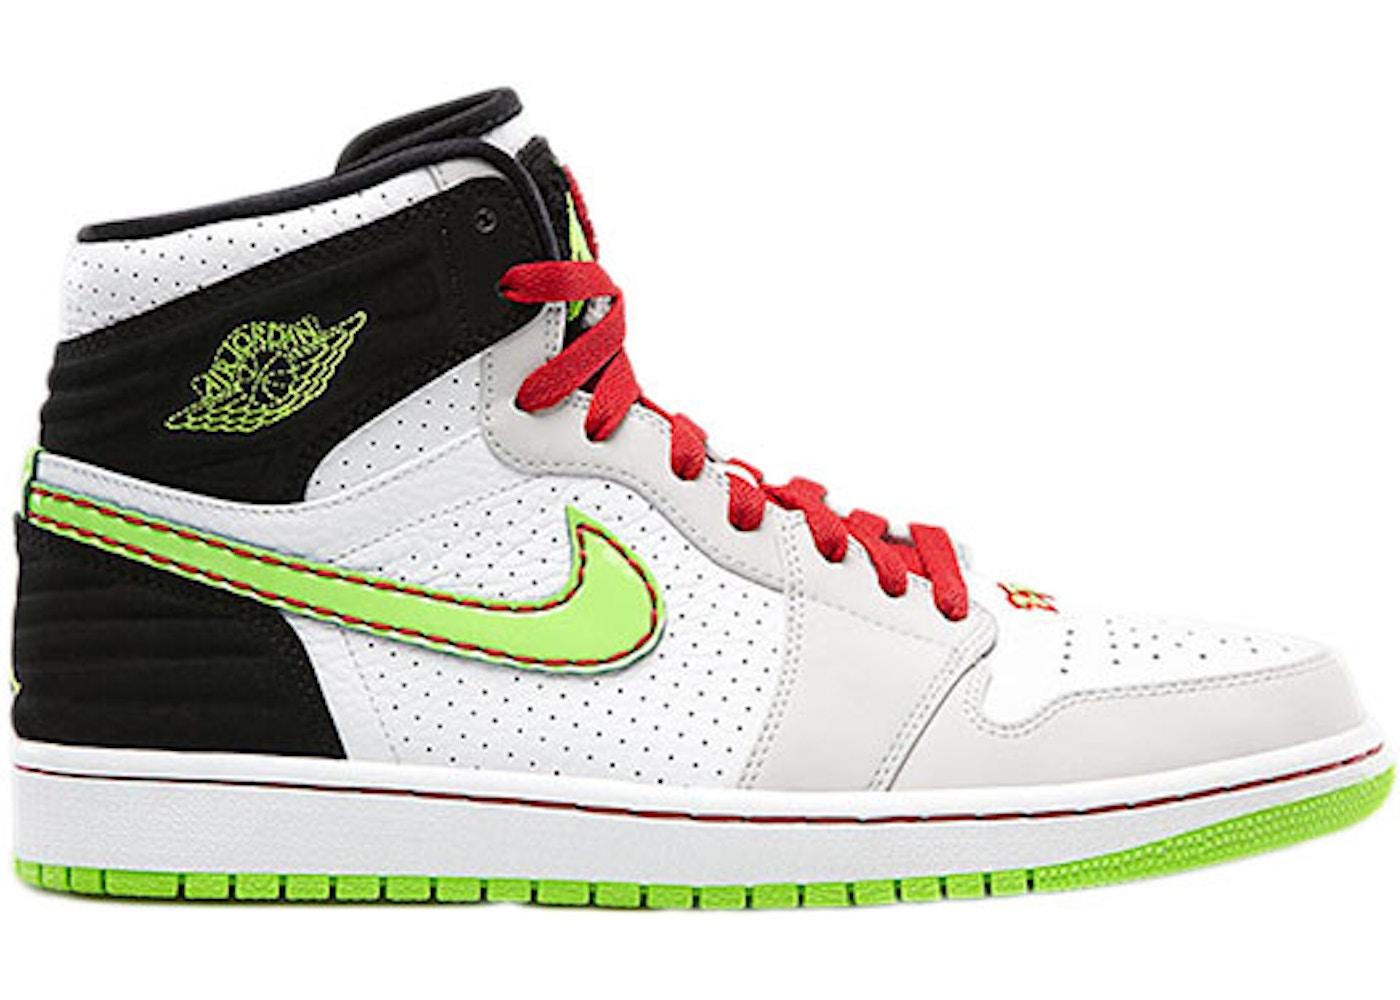 28d41127 Jordan 1 Retro Electric Green - 580514-150